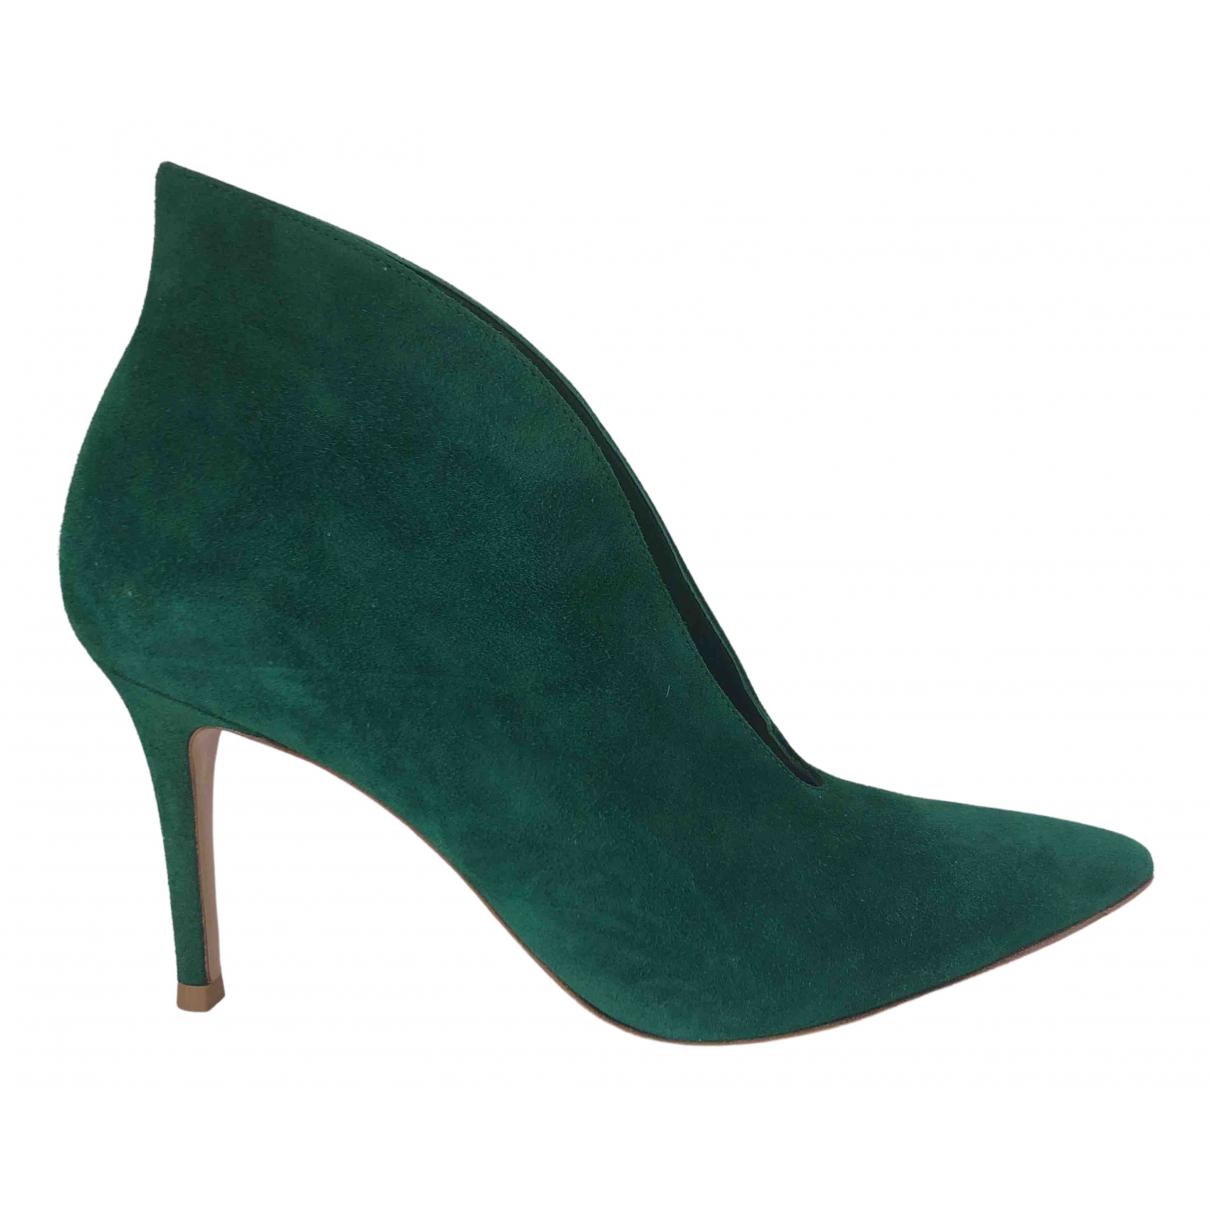 Gianvito Rossi N Green Suede Heels for Women 36 EU